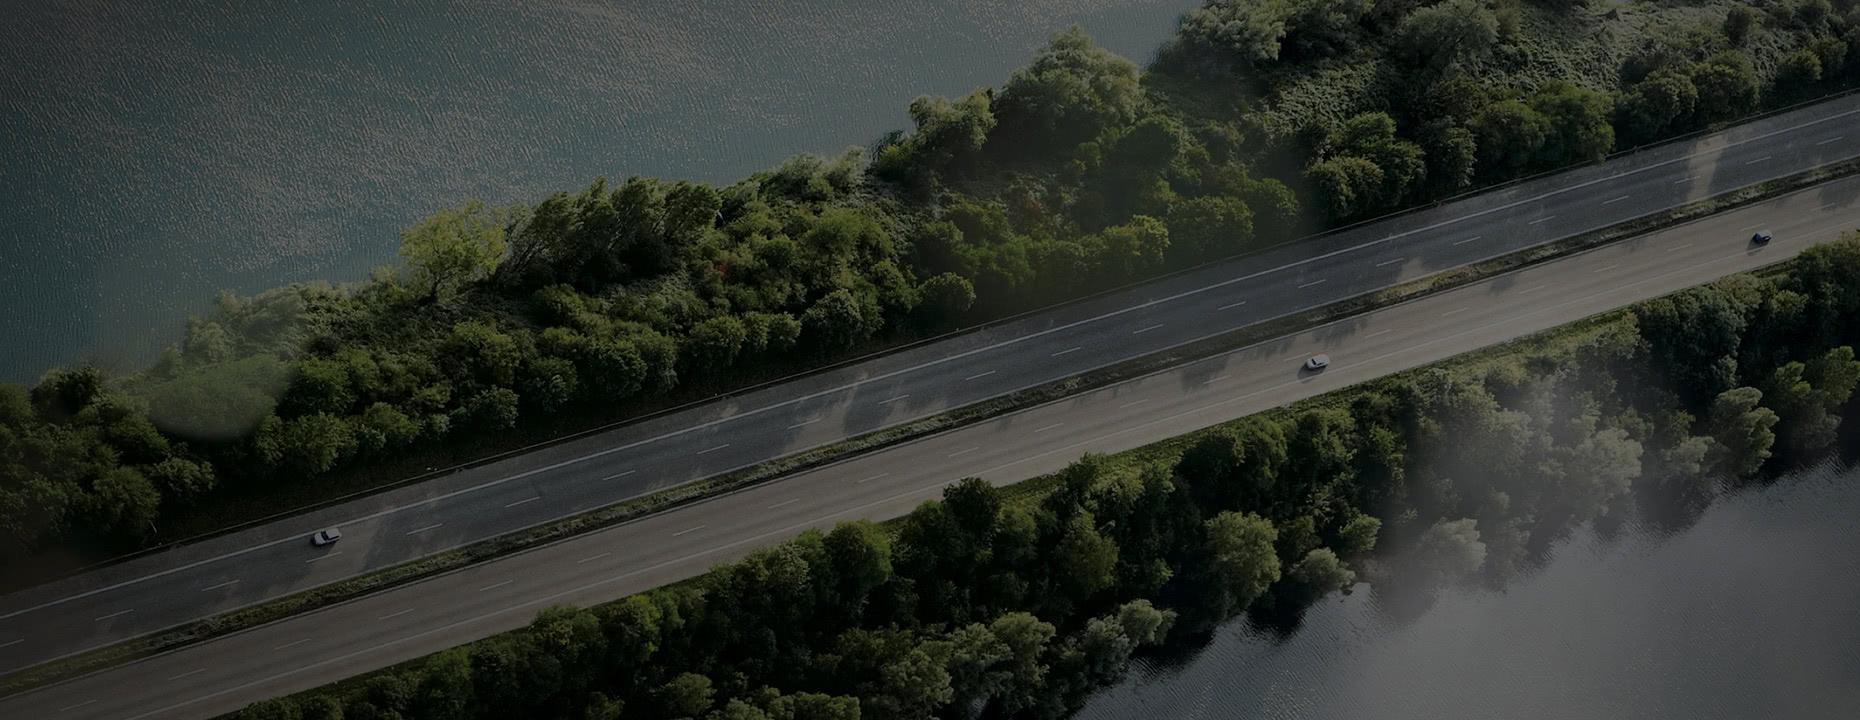 New Hyundai Accent - за привабливими цінами | Хюндай Мотор Україна - фото 9